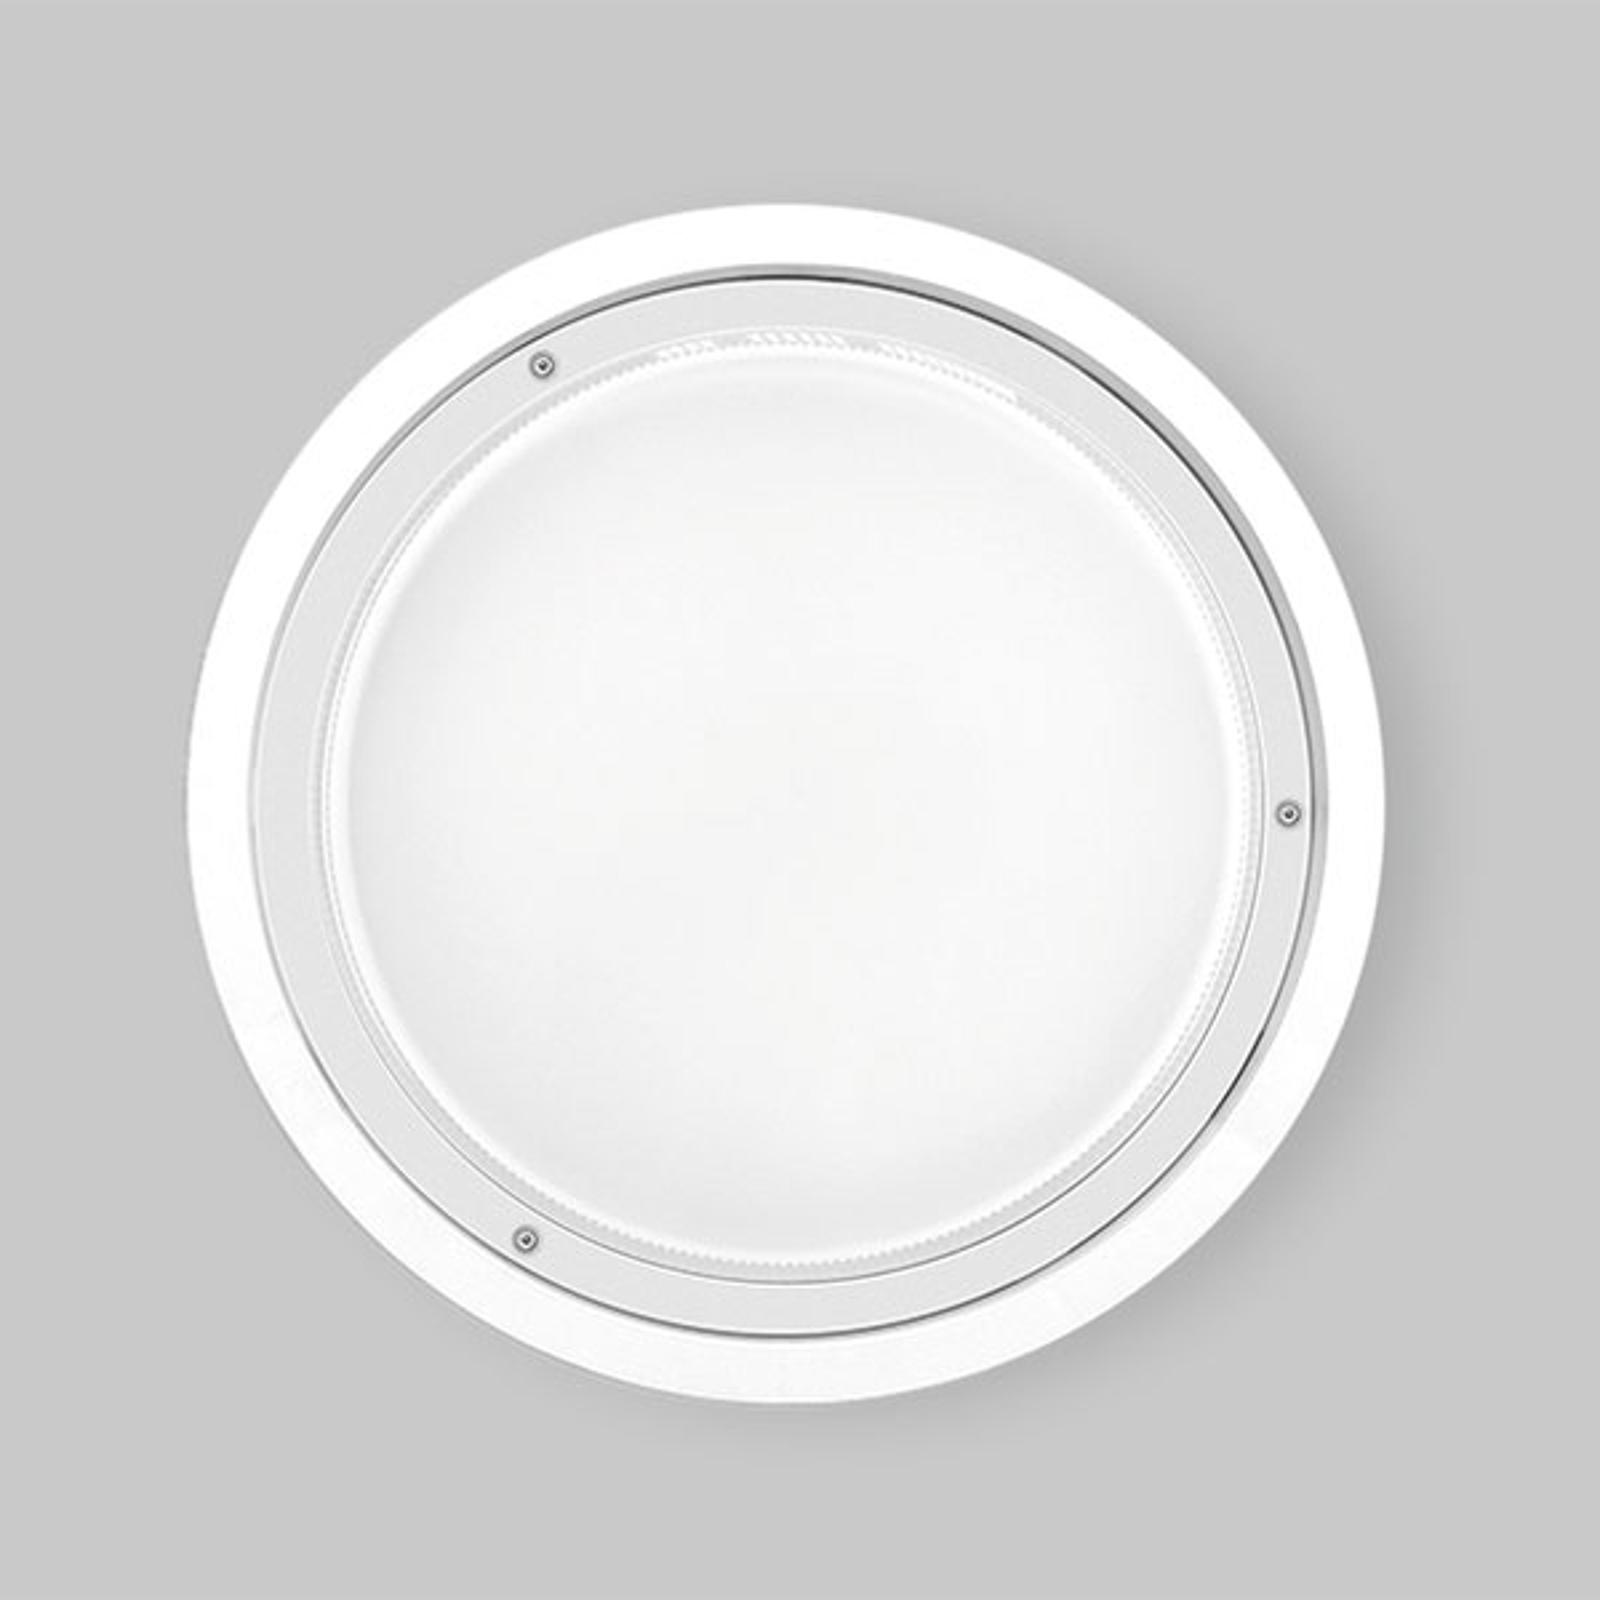 Wandlamp Multi+ 30 PC, breukvast, 16W, 4.000K